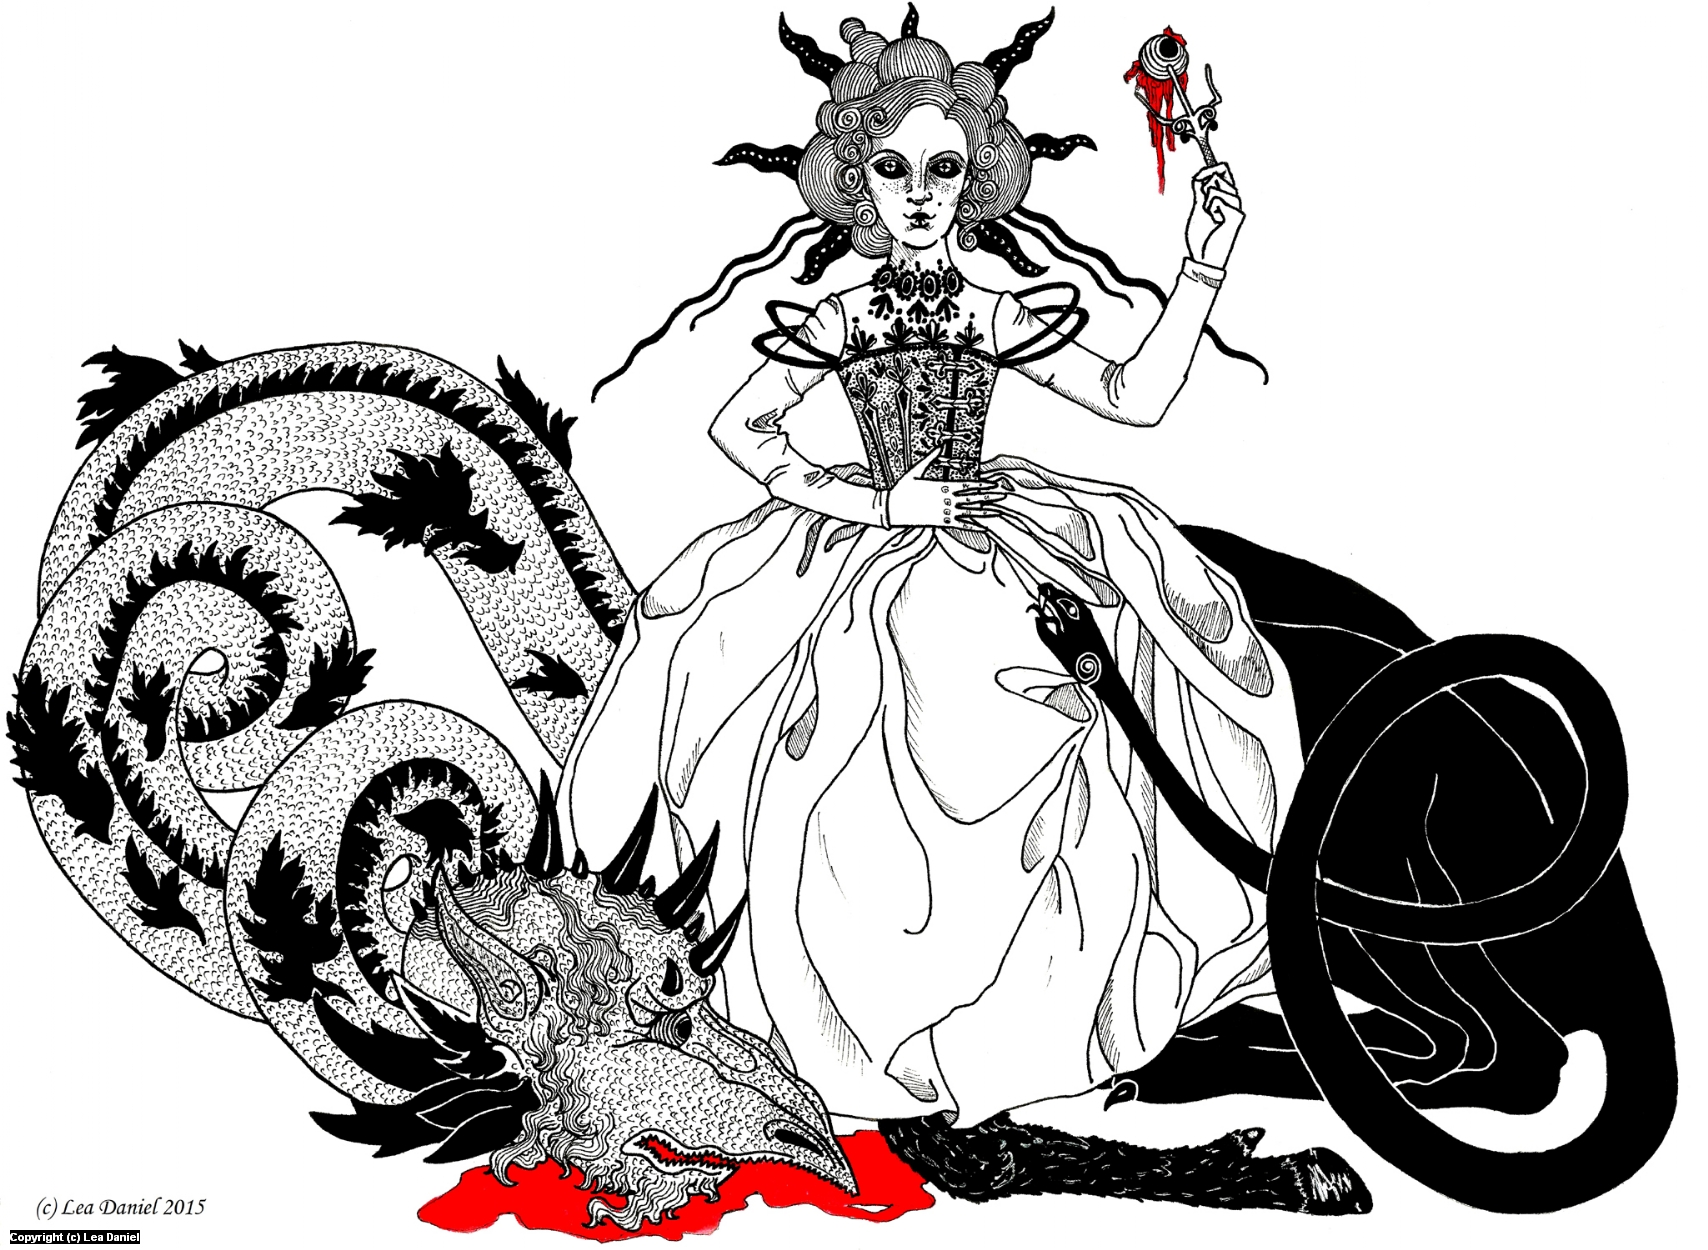 Beauty and the Beast Artwork by Anastasiia Antonova